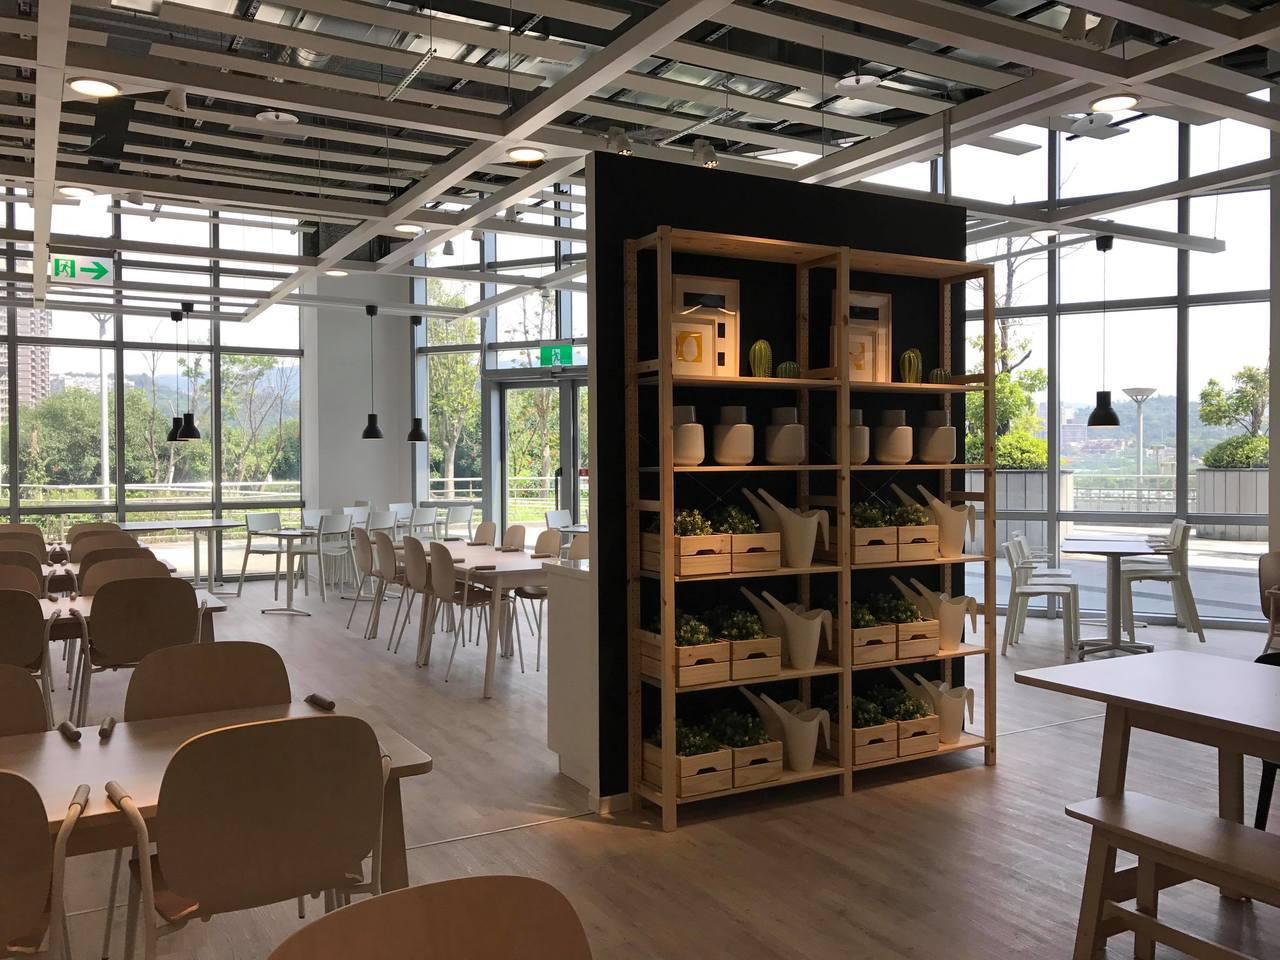 IKEA新店店是唯一擁有河濱公園景觀的IKEA瑞典餐廳。記者陳立儀/攝影